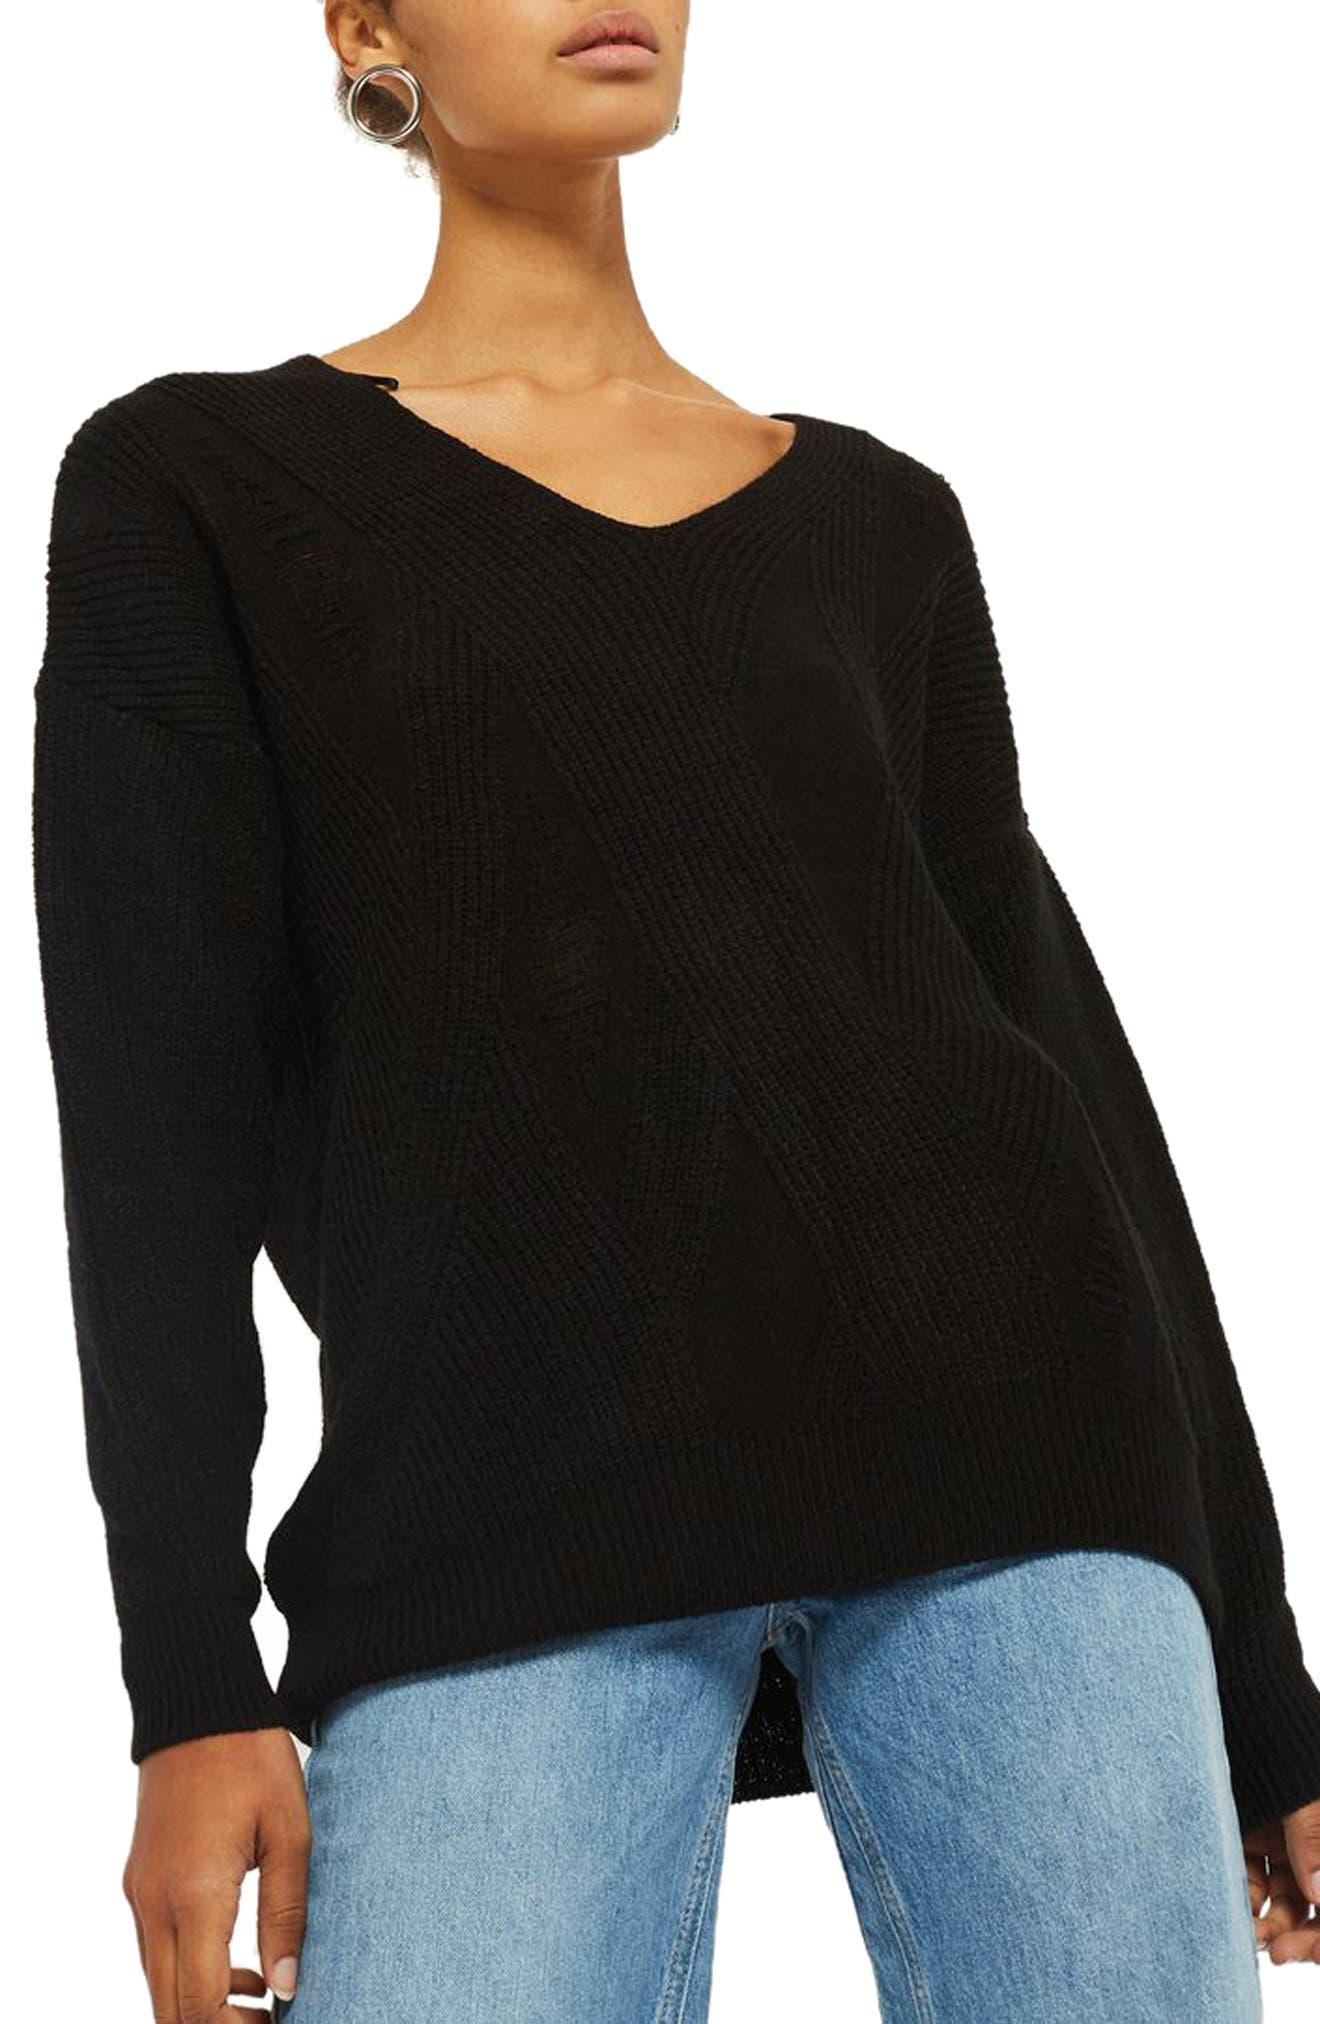 Ladder Stitch Sweater,                             Main thumbnail 1, color,                             Black